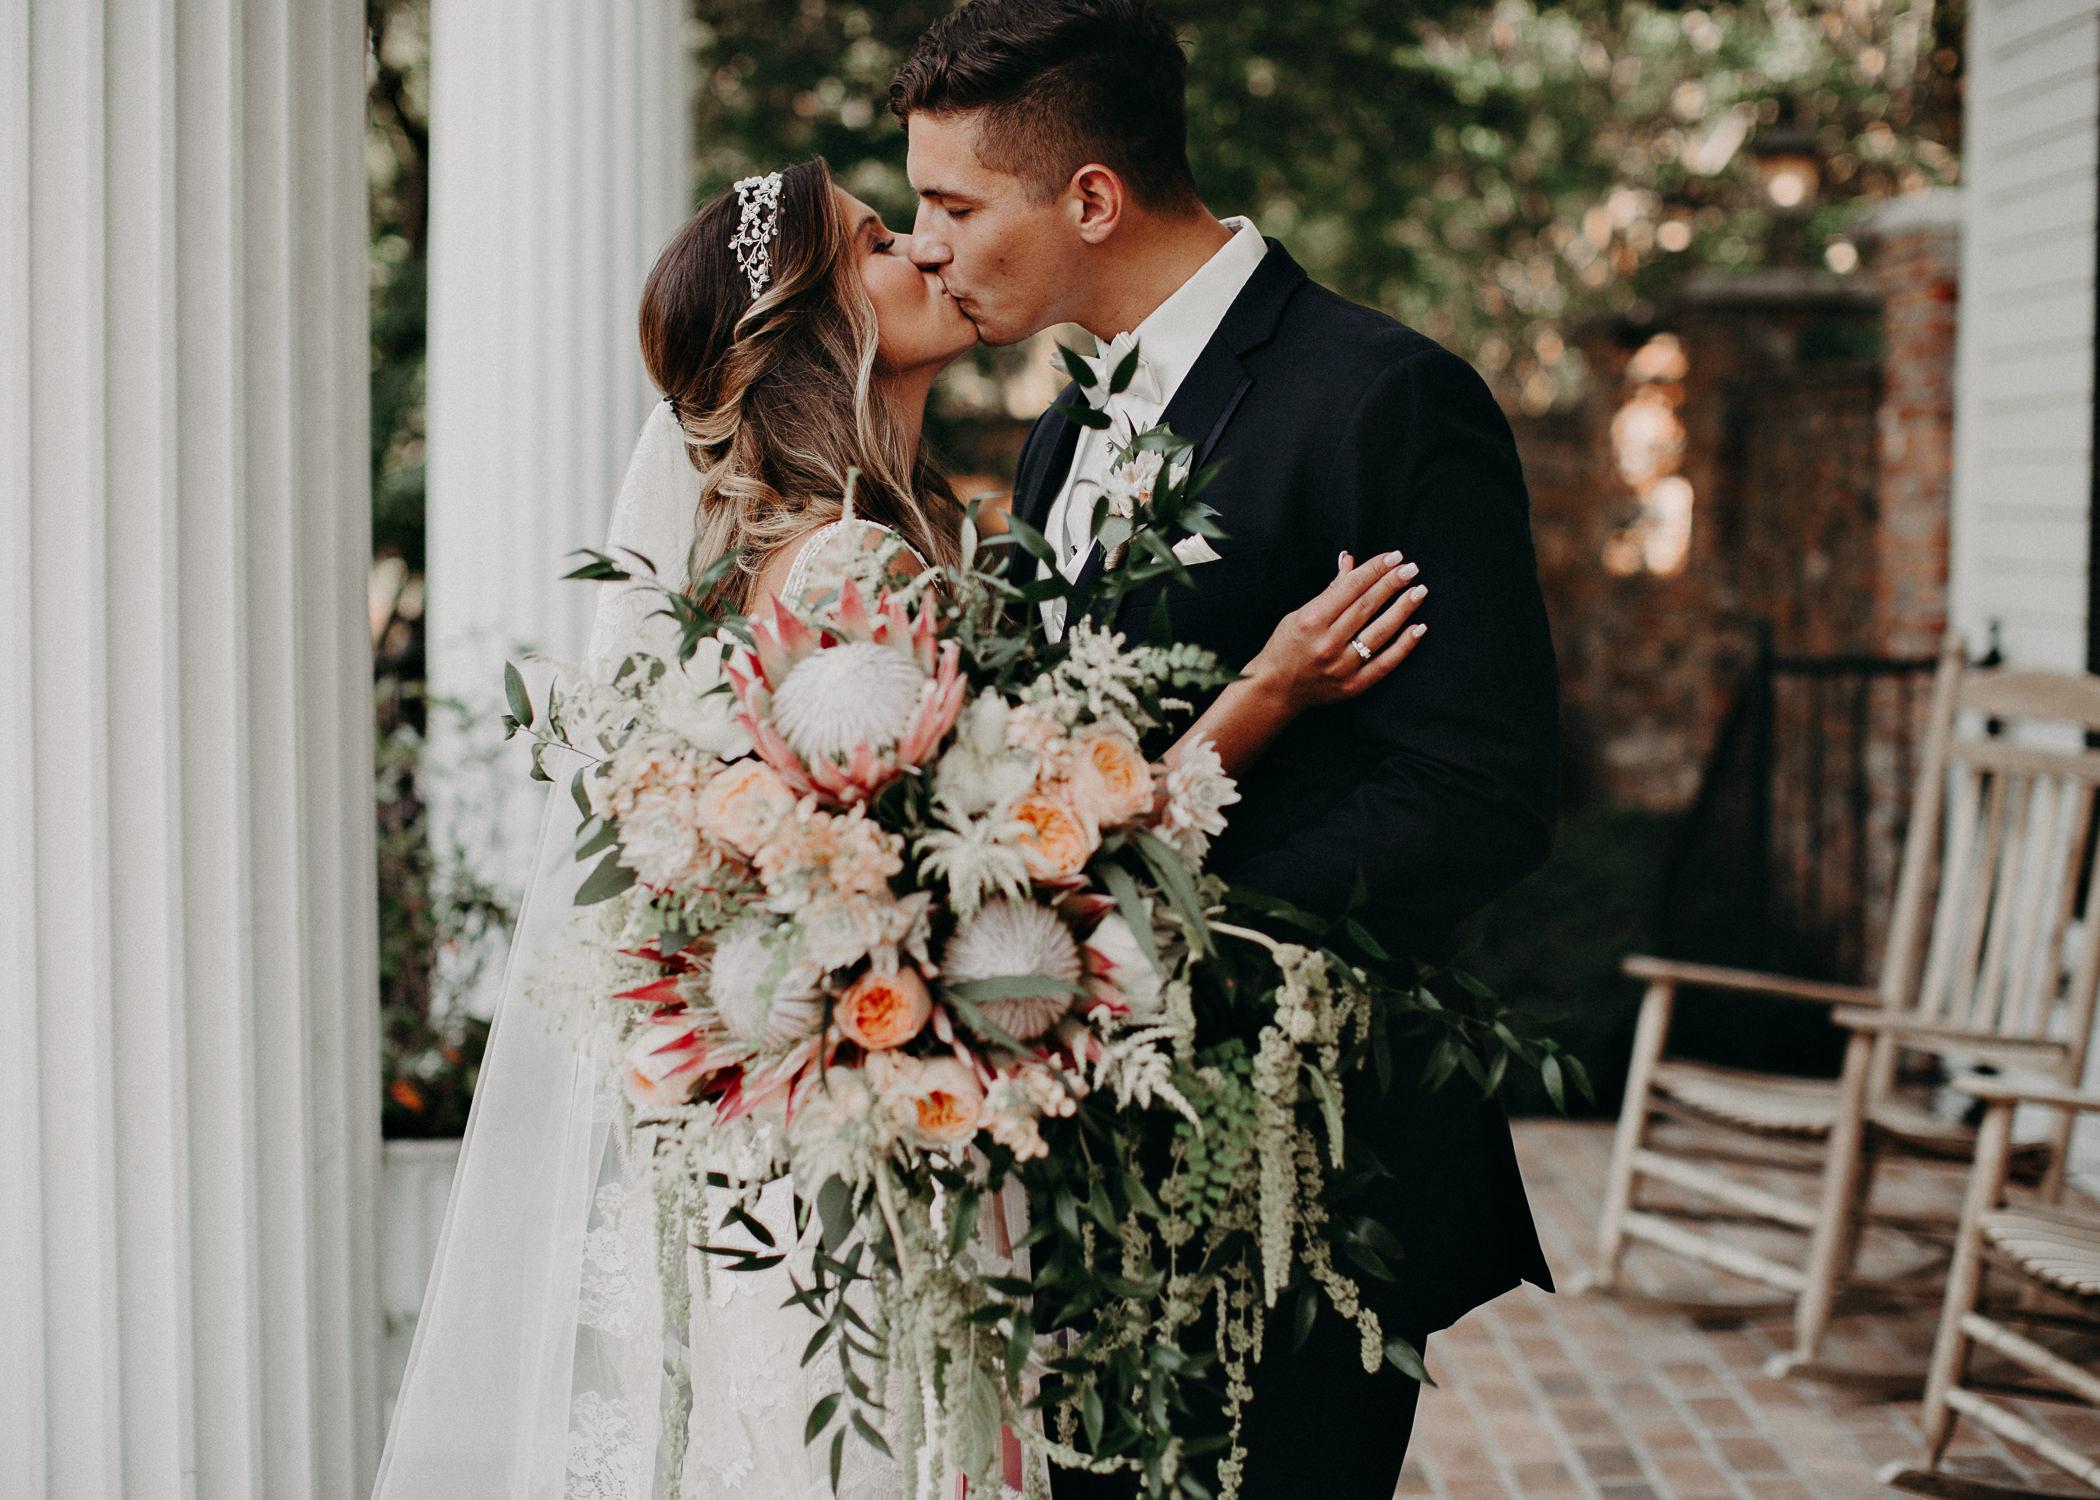 58Carl House Wedding Venue Ga, Atlanta Wedding Photographer - Boho, Bohemian, Junebug Weddings, Vintage, Retro, Trendy. Aline Marin Photography. .jpg